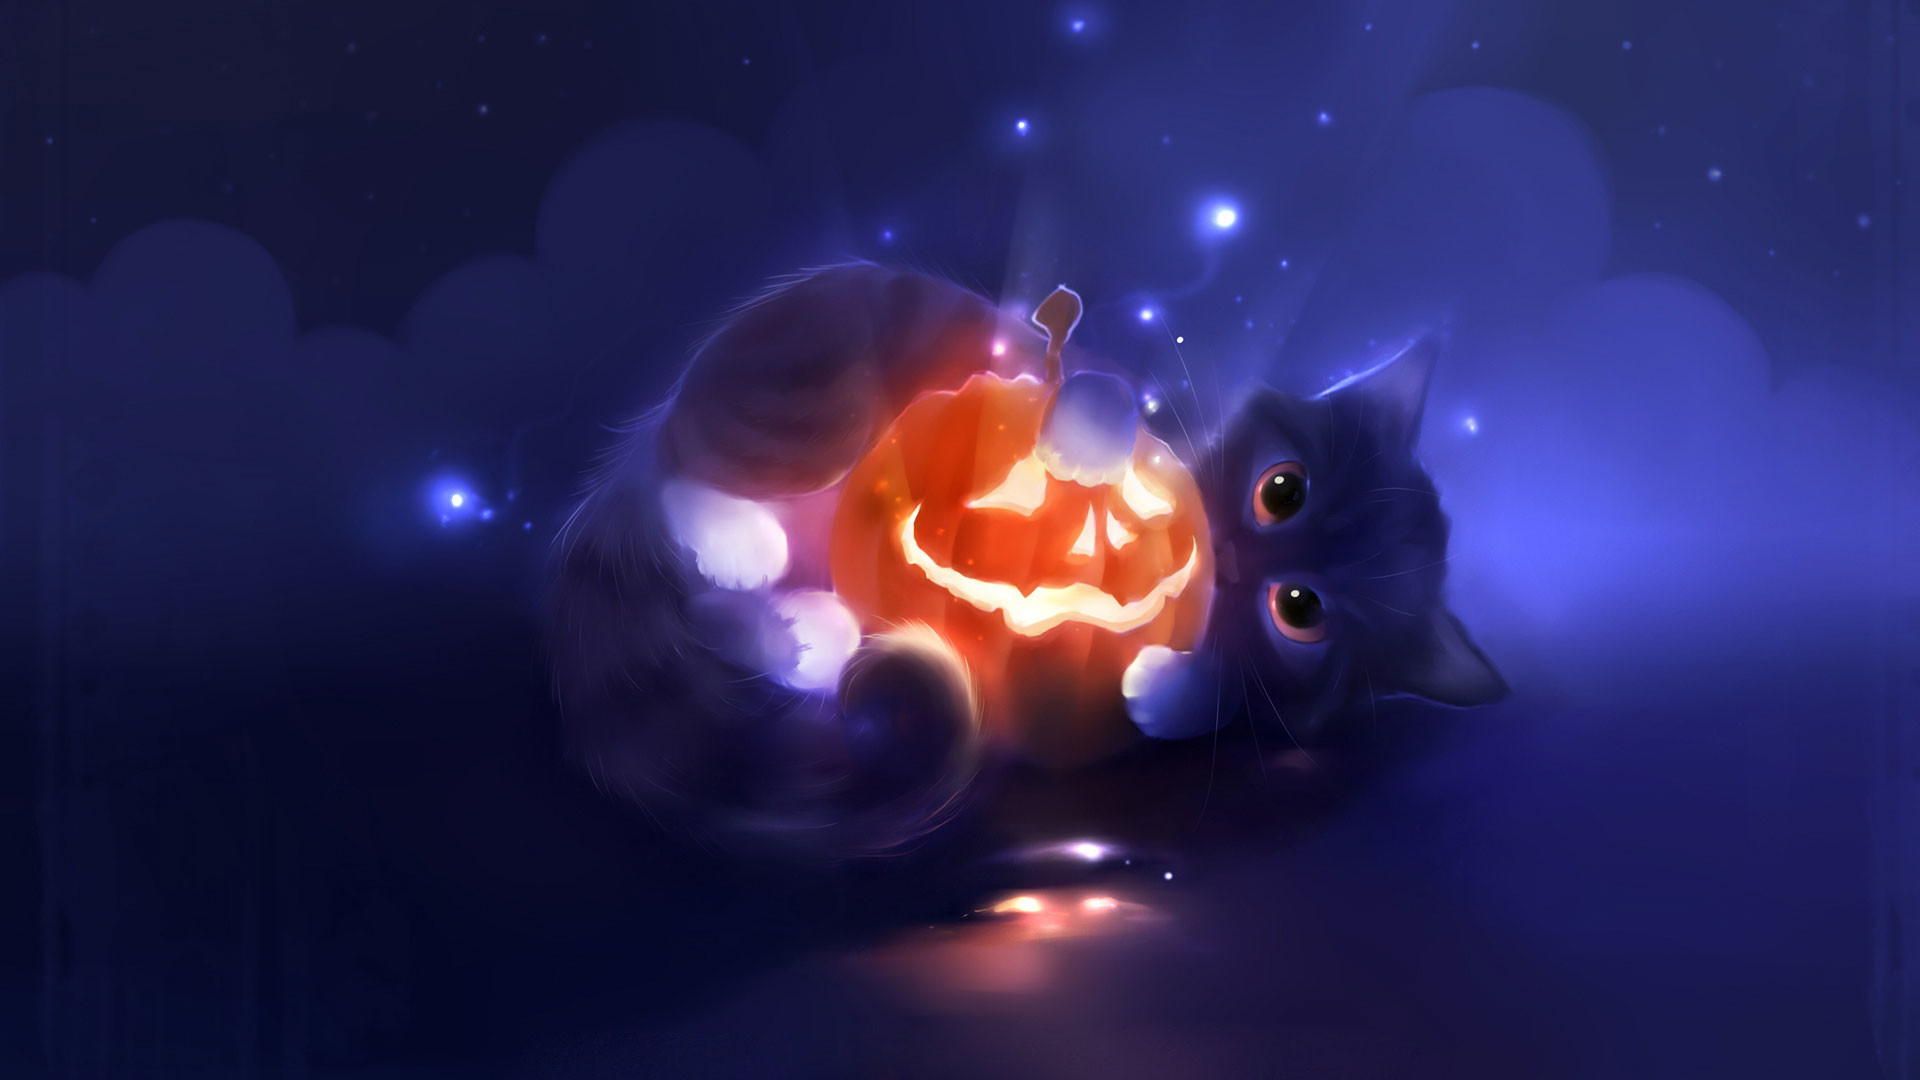 hd pics photos 2d cat halloween animated hd quality desktop background  wallpaper